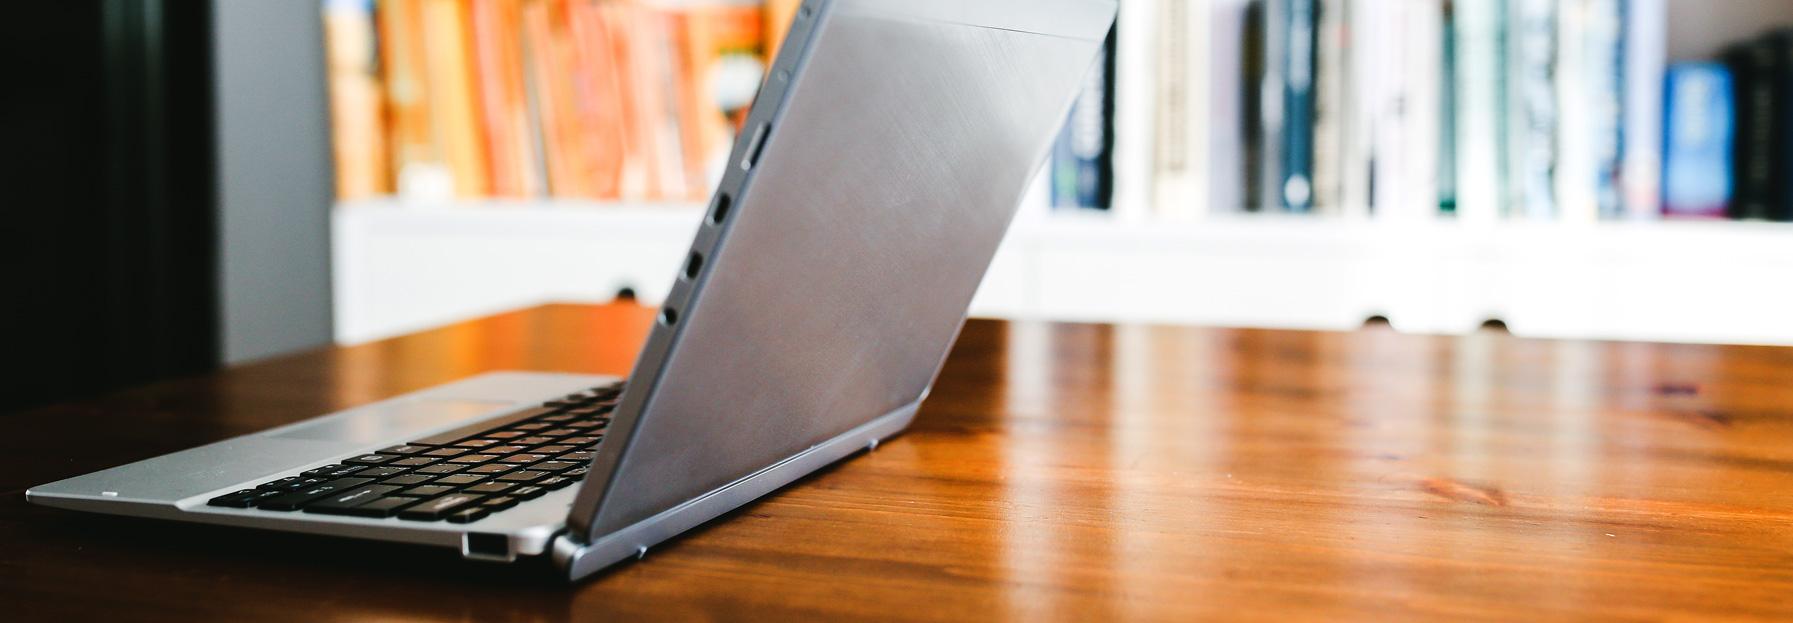 Laptop1793x623